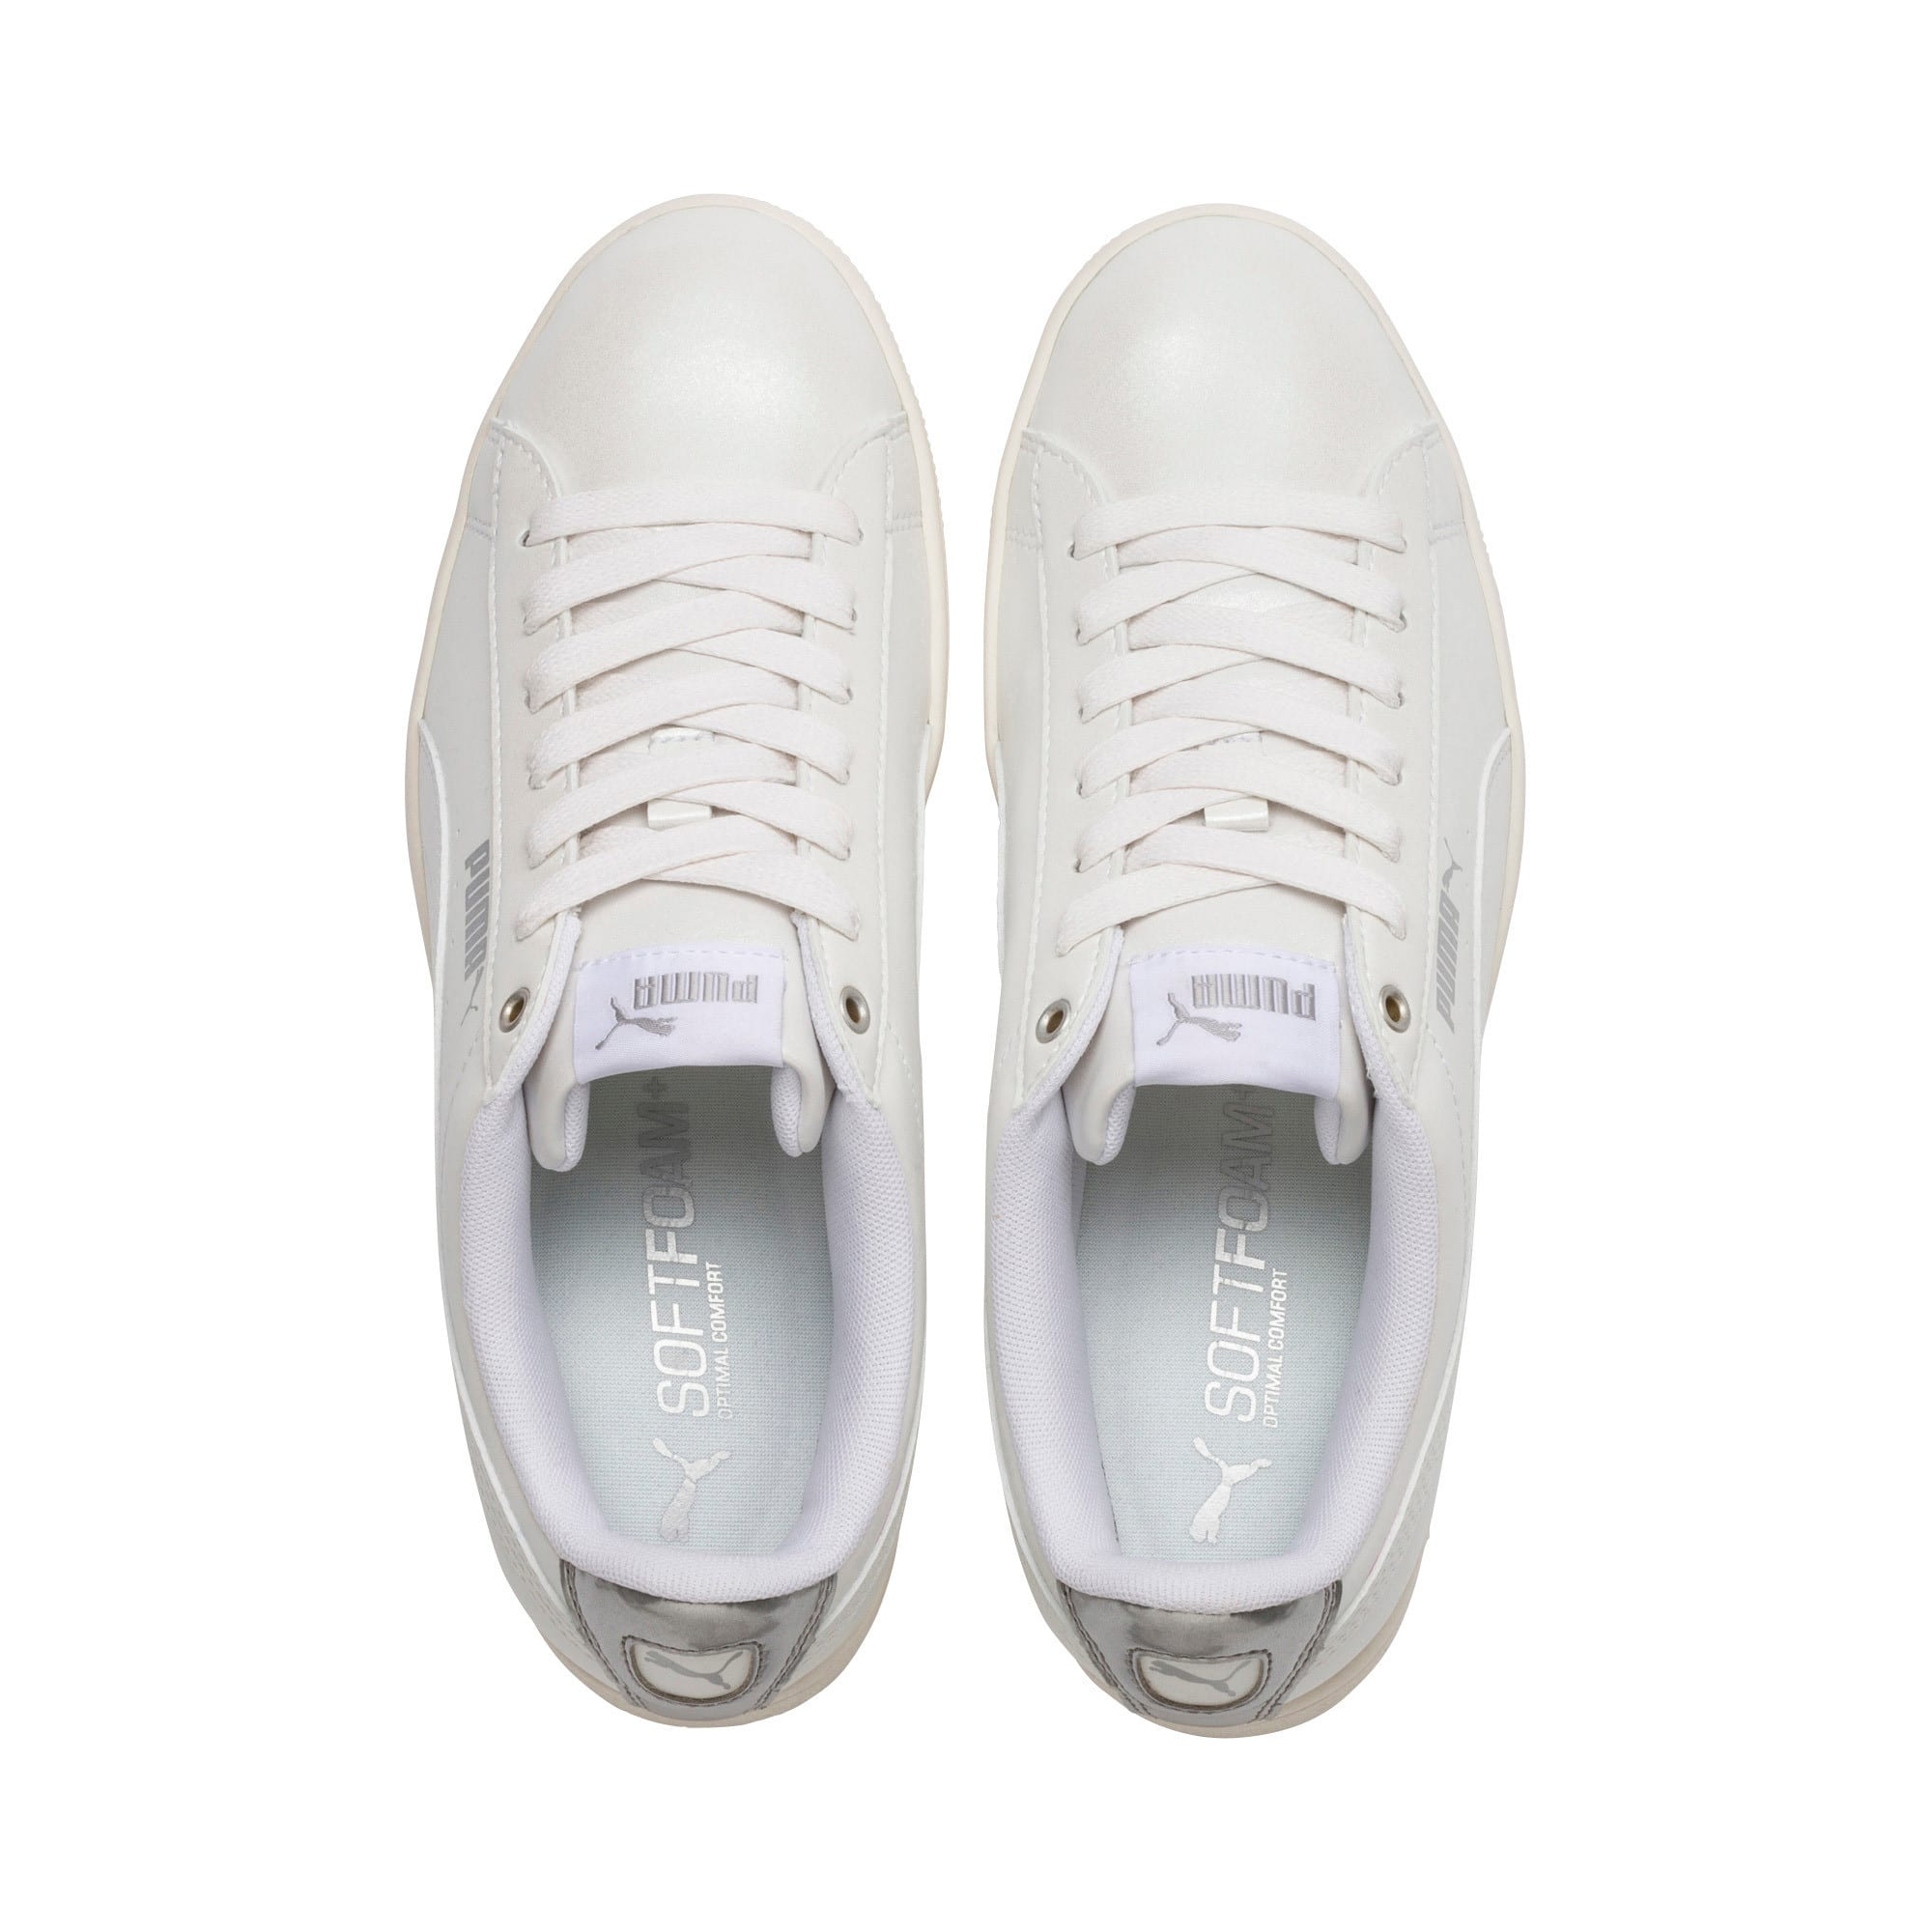 Thumbnail 6 of Puma Vikky LX Sneakers, Puma White-White-Whisper, medium